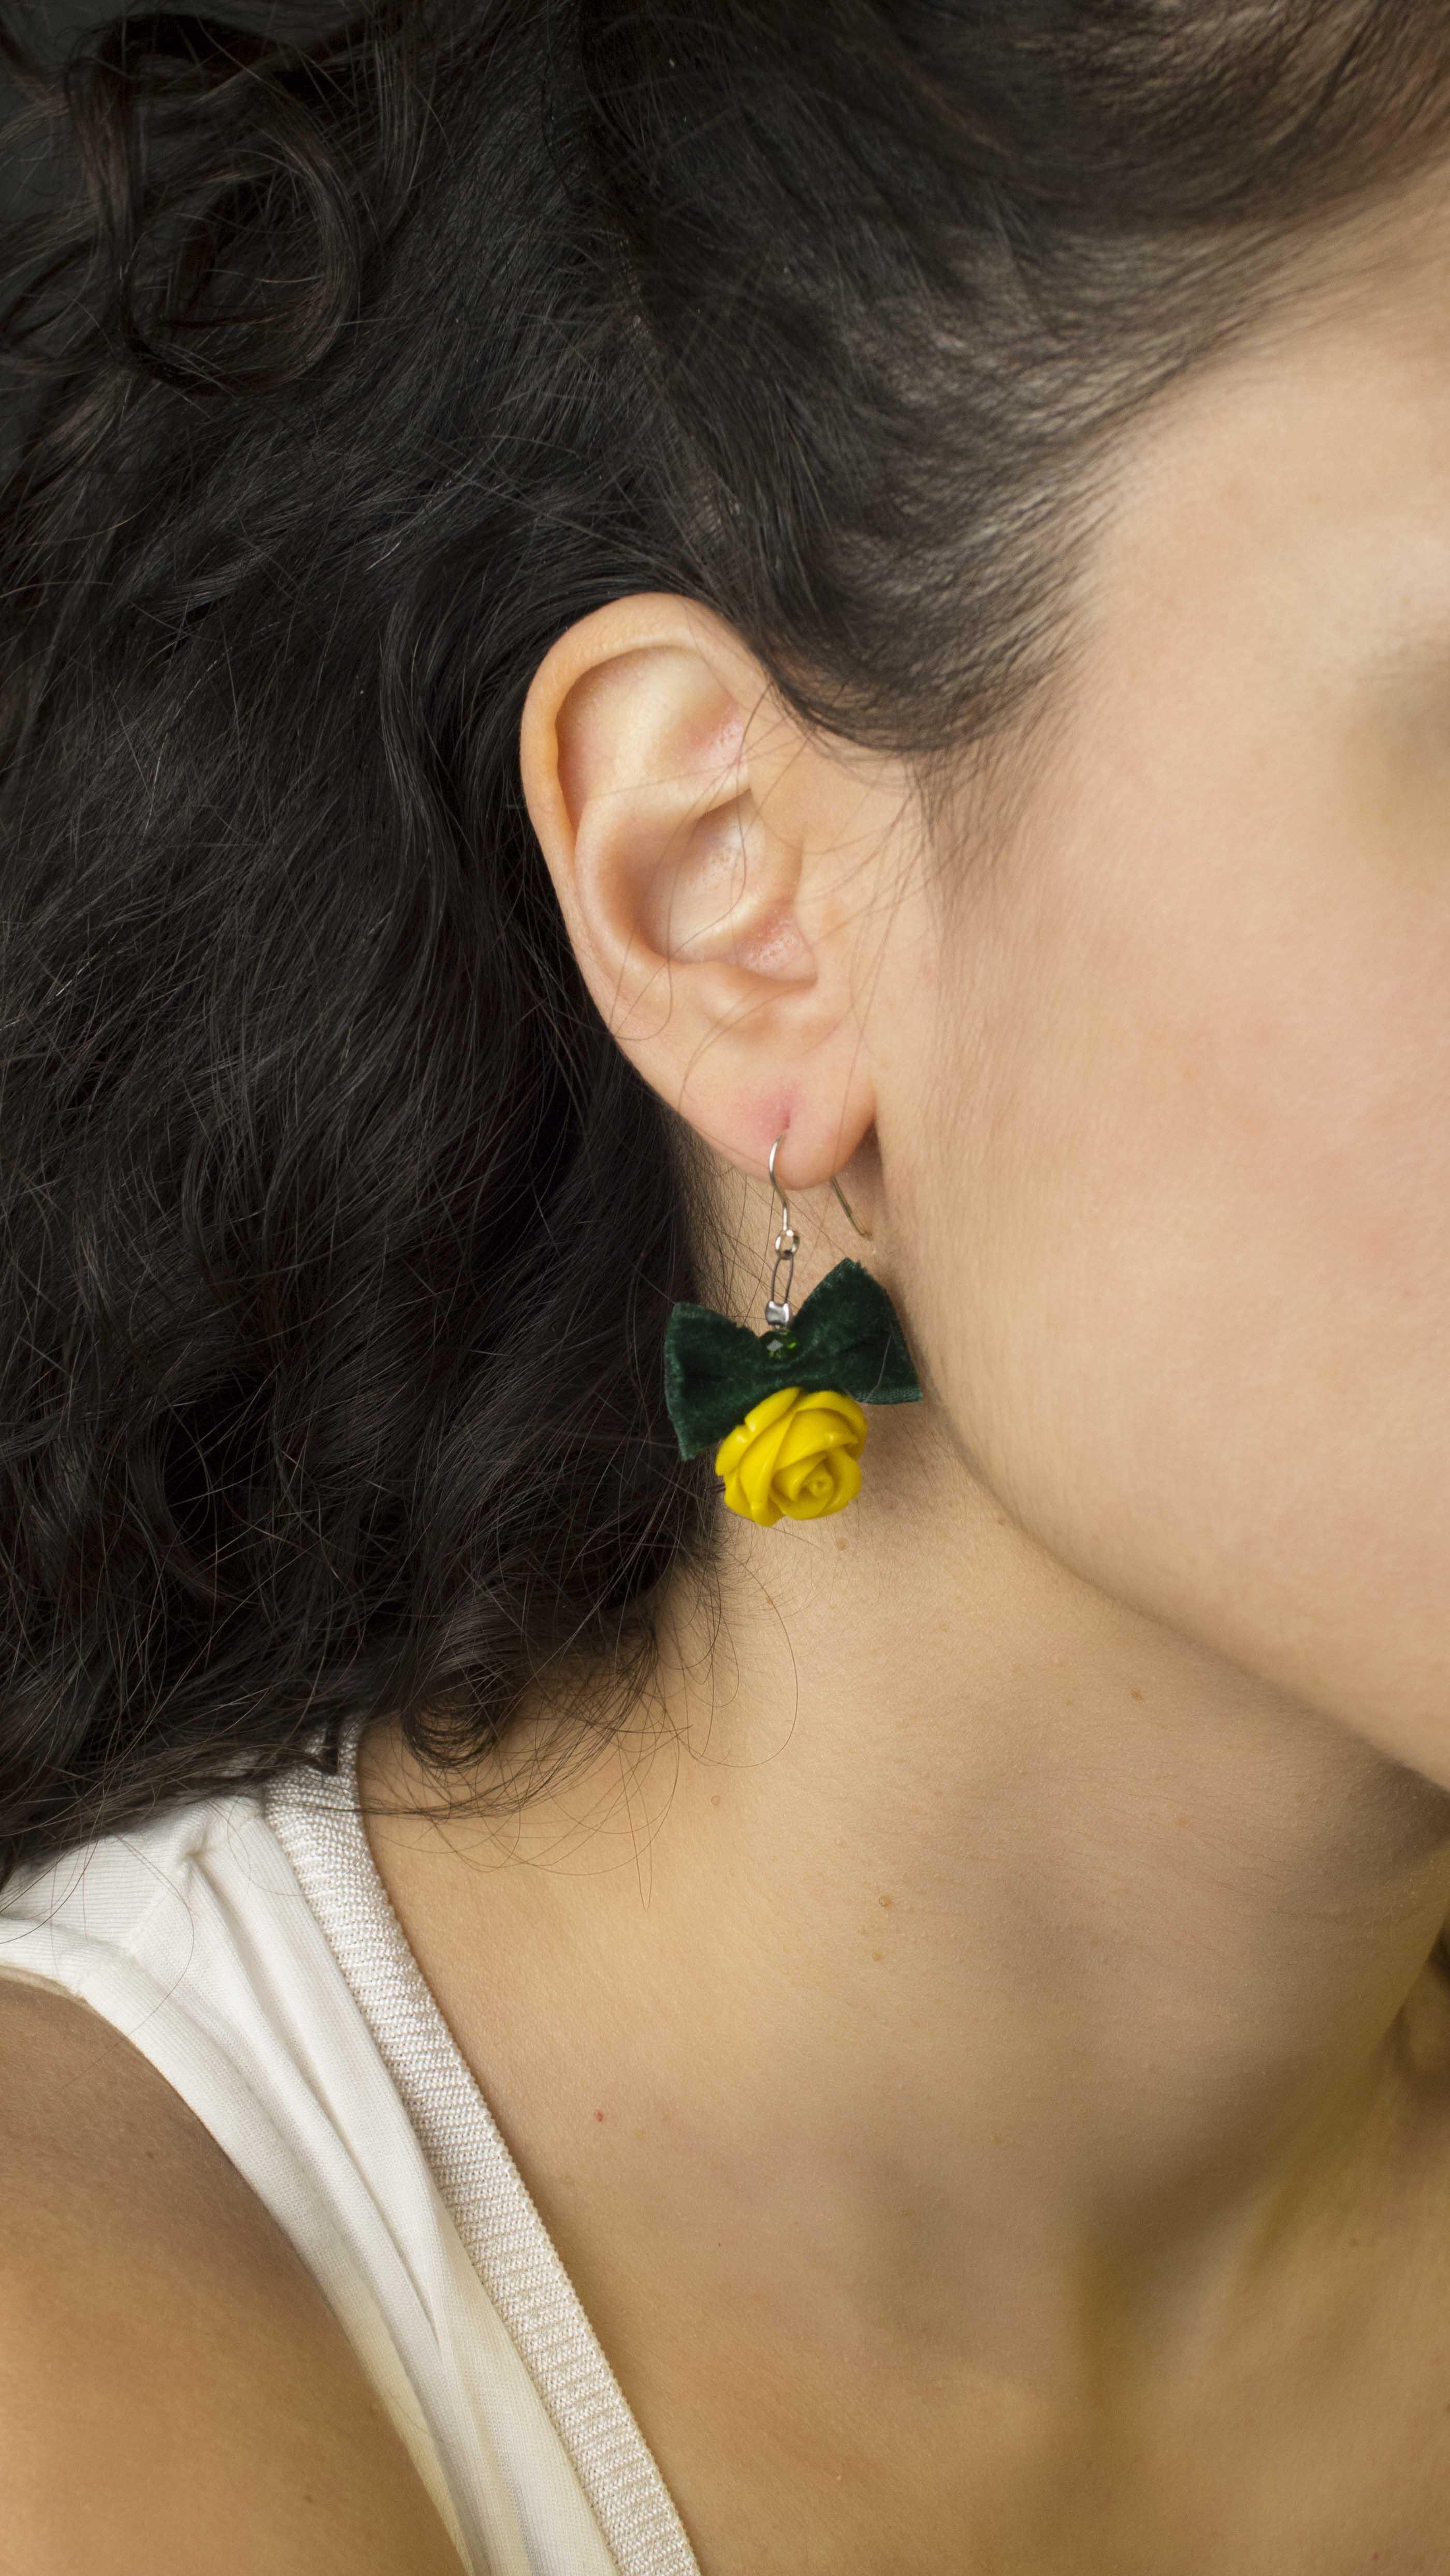 Jt Ασημένια σκουλαρίκια κίτρινα τριαντάφυλλα με βελούδο